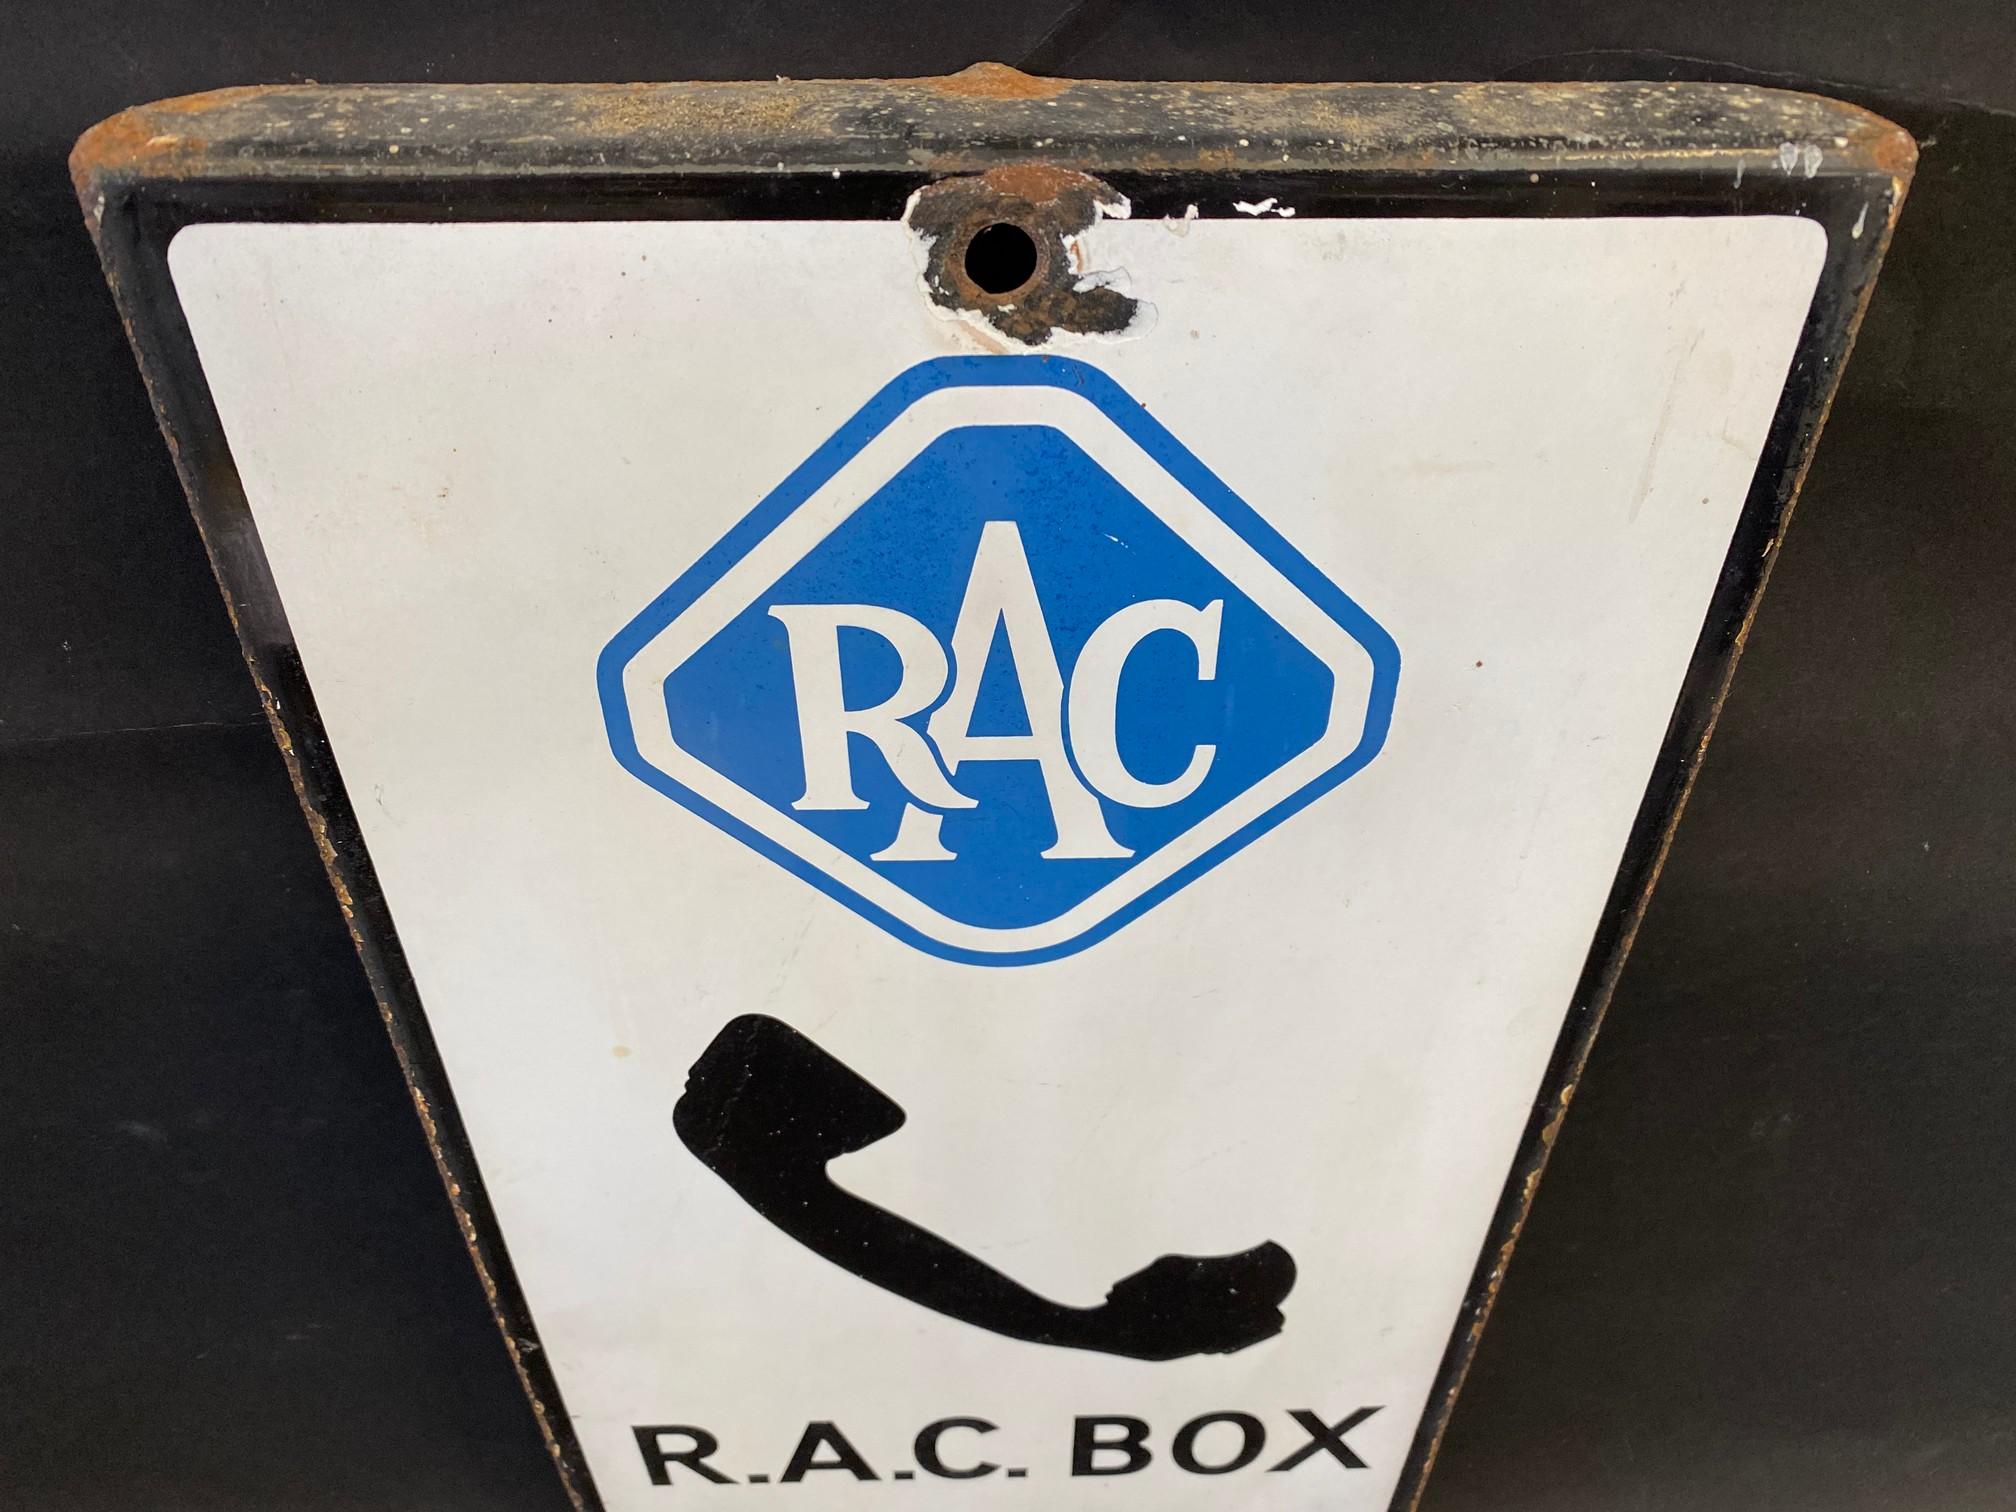 "An RAC Box 1 mile rectangular enamel sign, 10 x 20"". - Image 2 of 4"